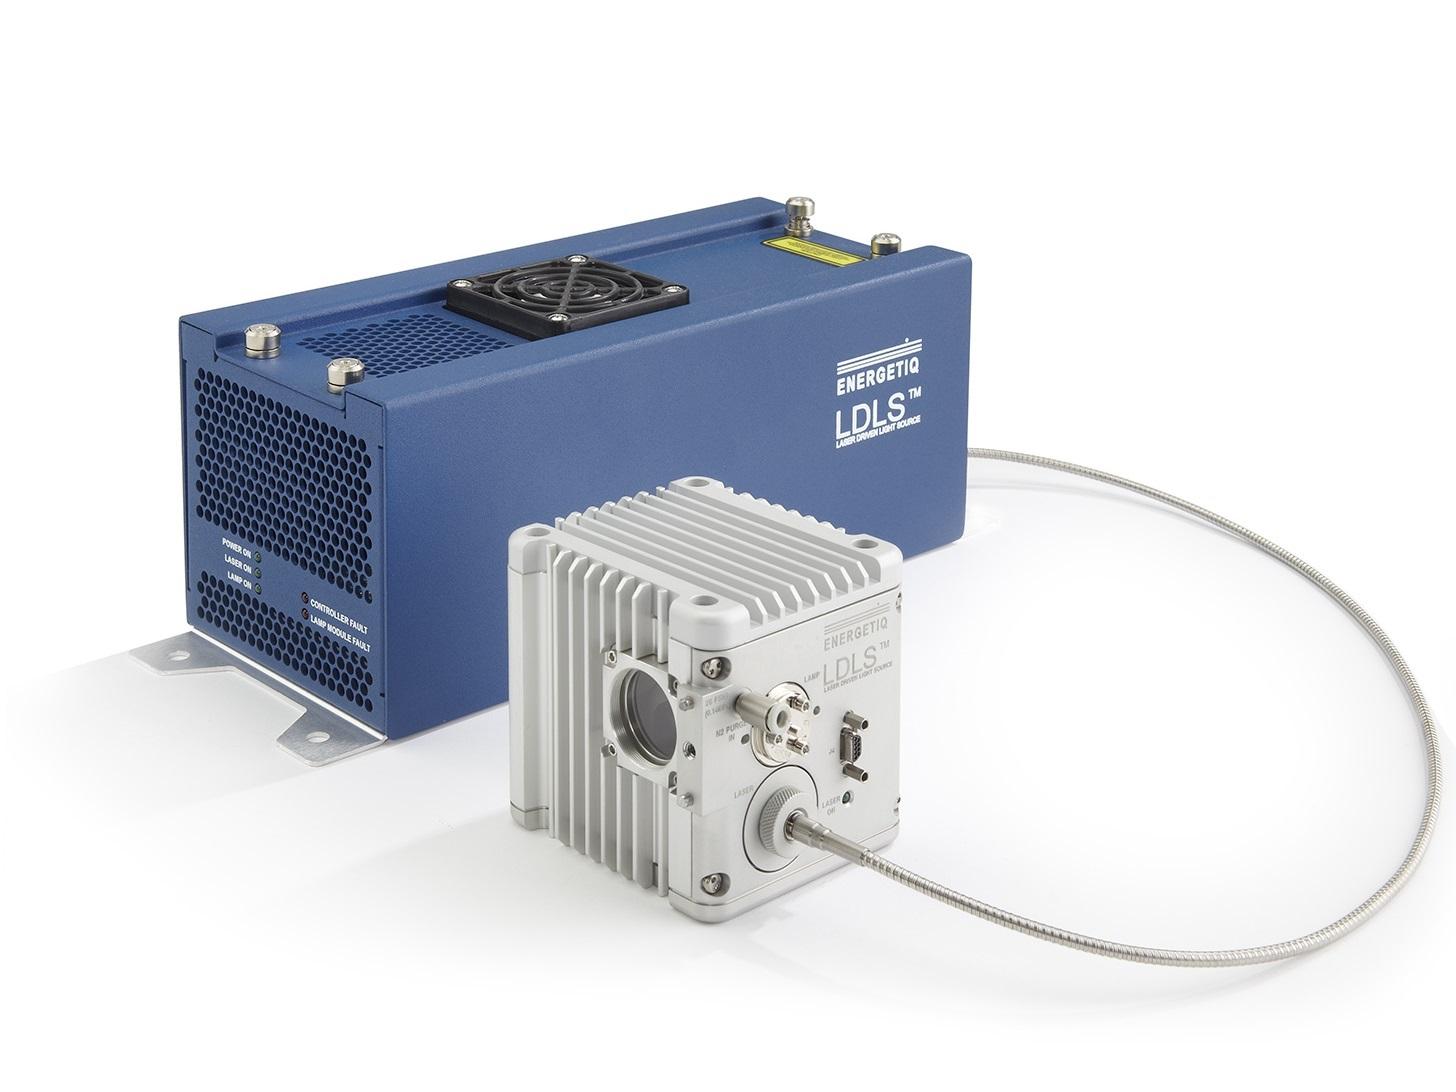 LDLS EQ-99X 是一个采用专利的激光驱动技术激发等离子体的光源